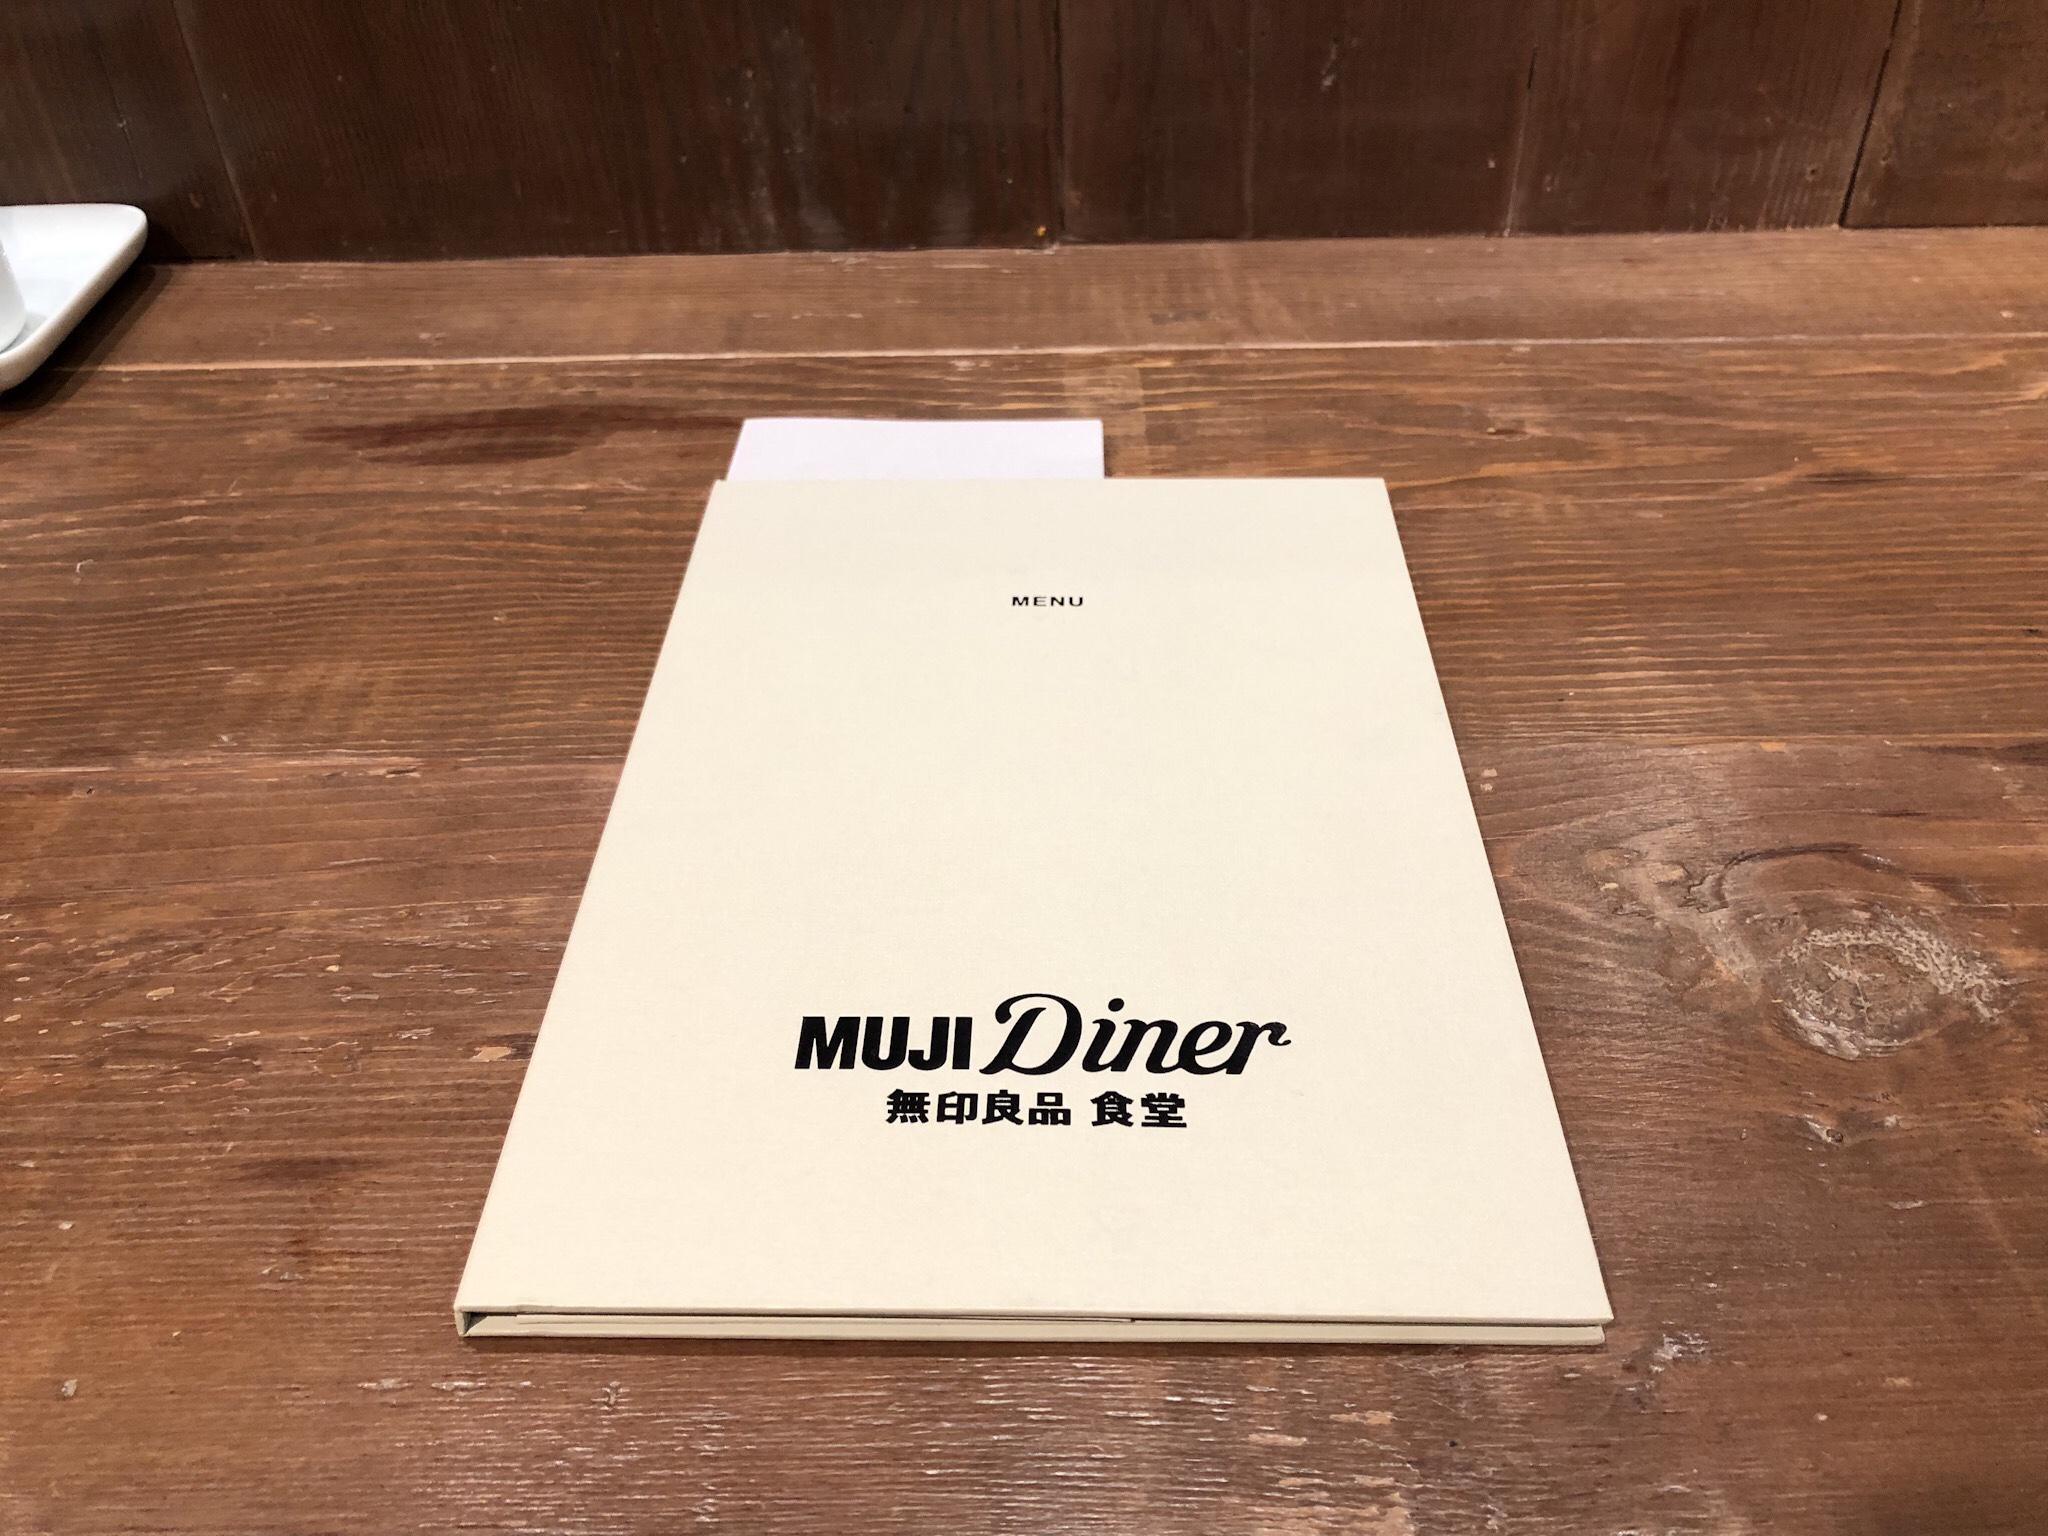 MUJI Dinerメニュー